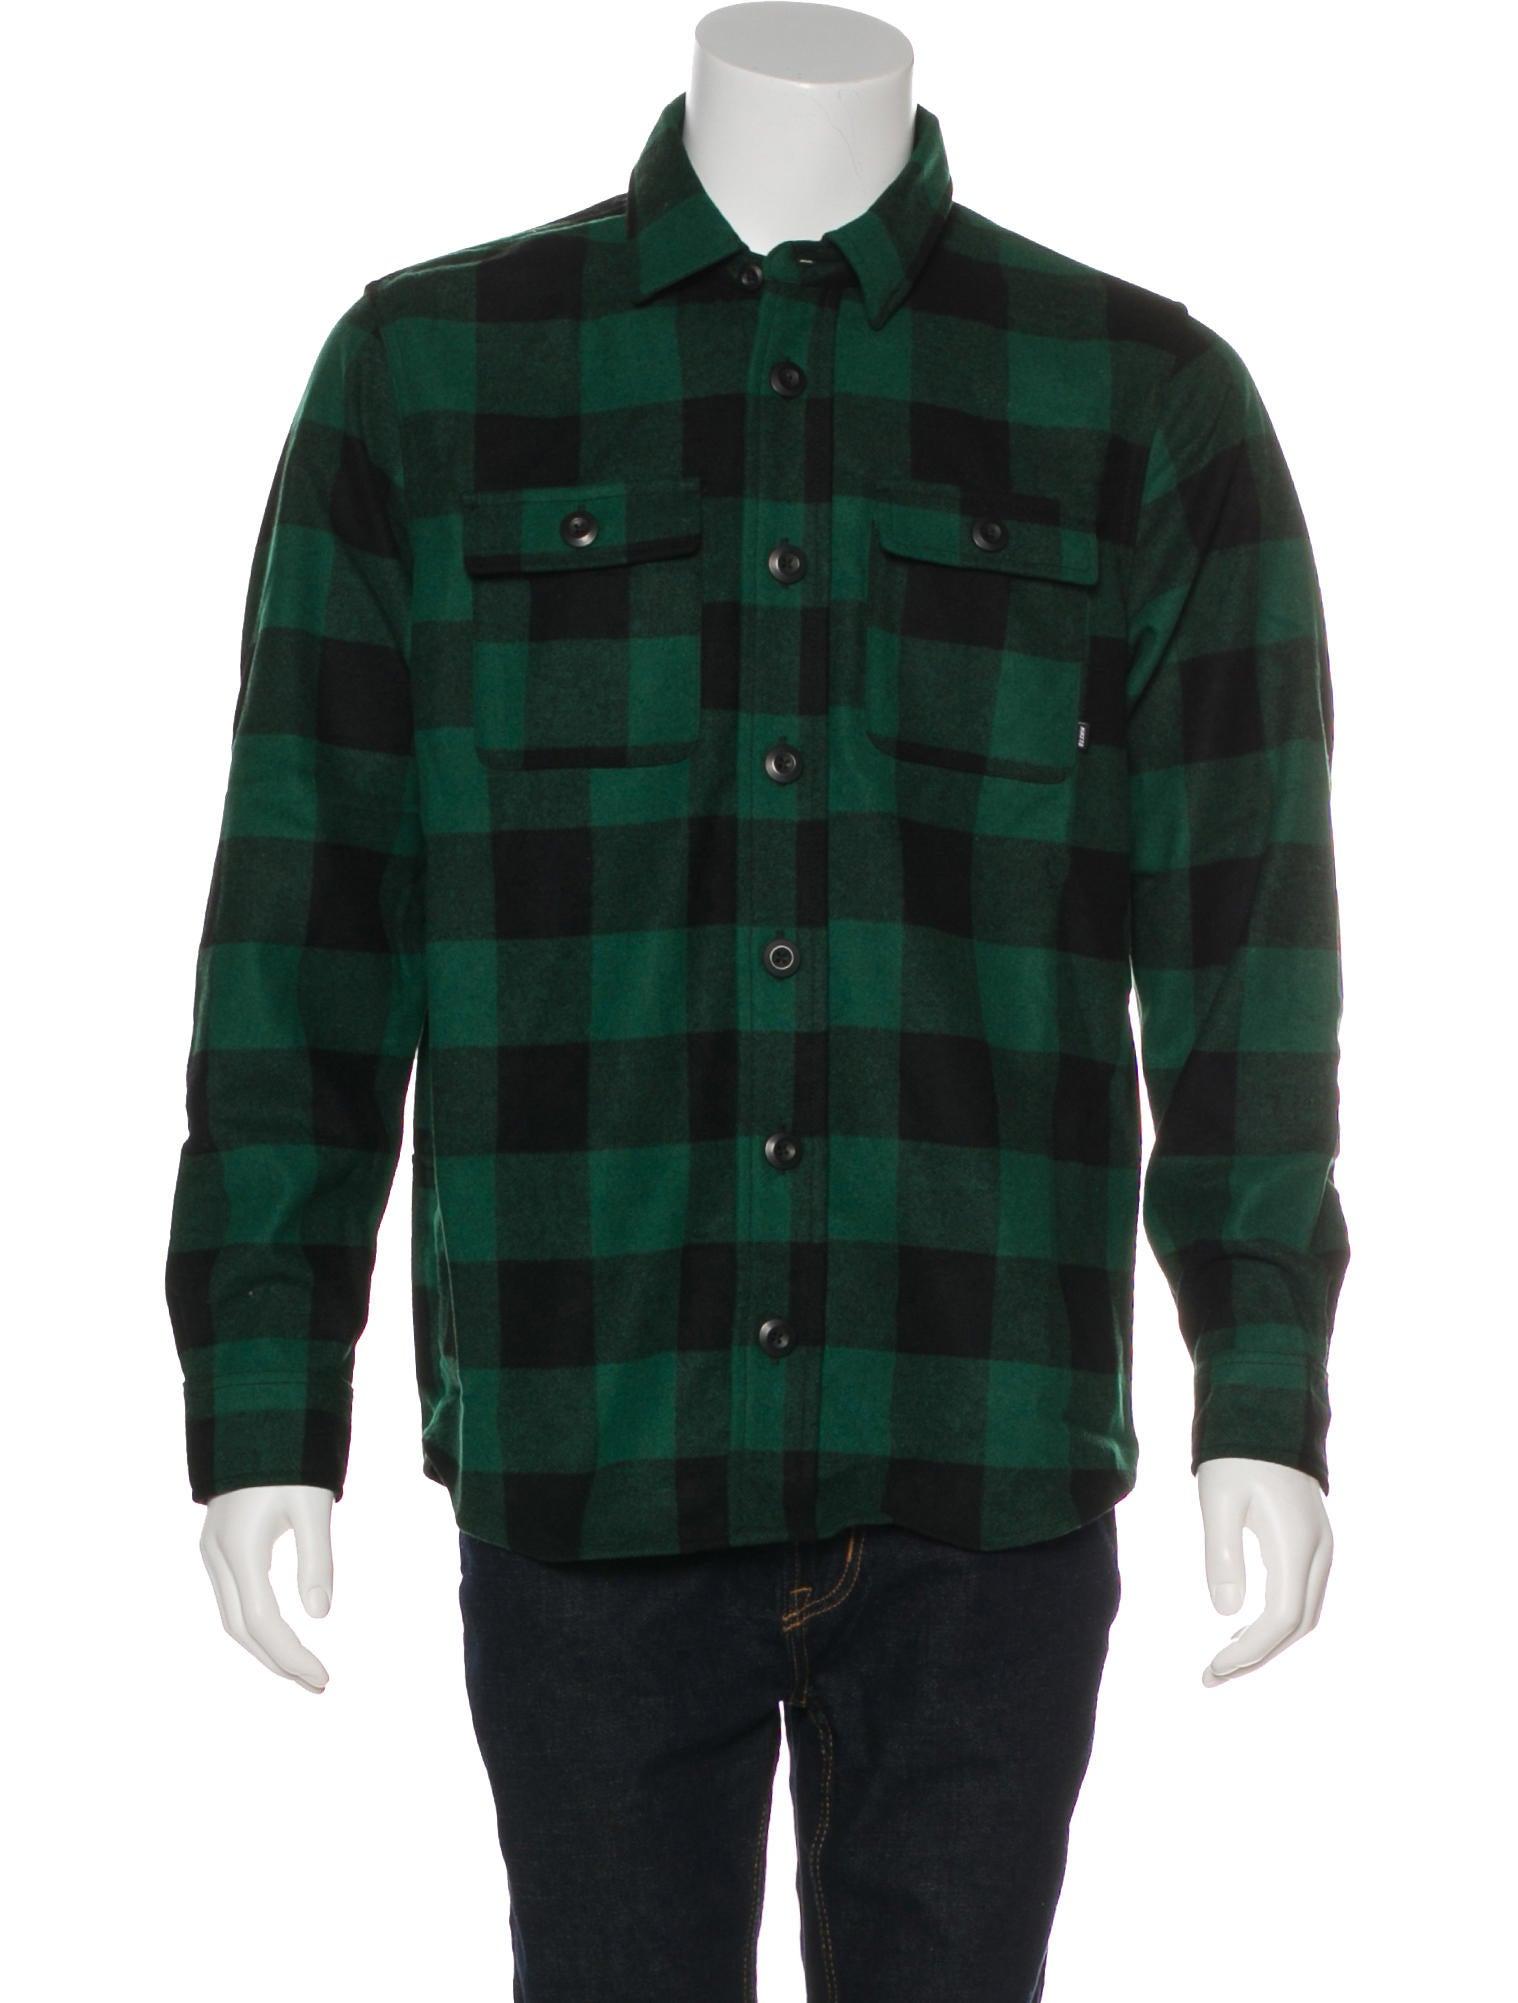 0c00e5570 Nike SB Button-Up Shirt w/ Tags - Clothing - WU226603 | The RealReal